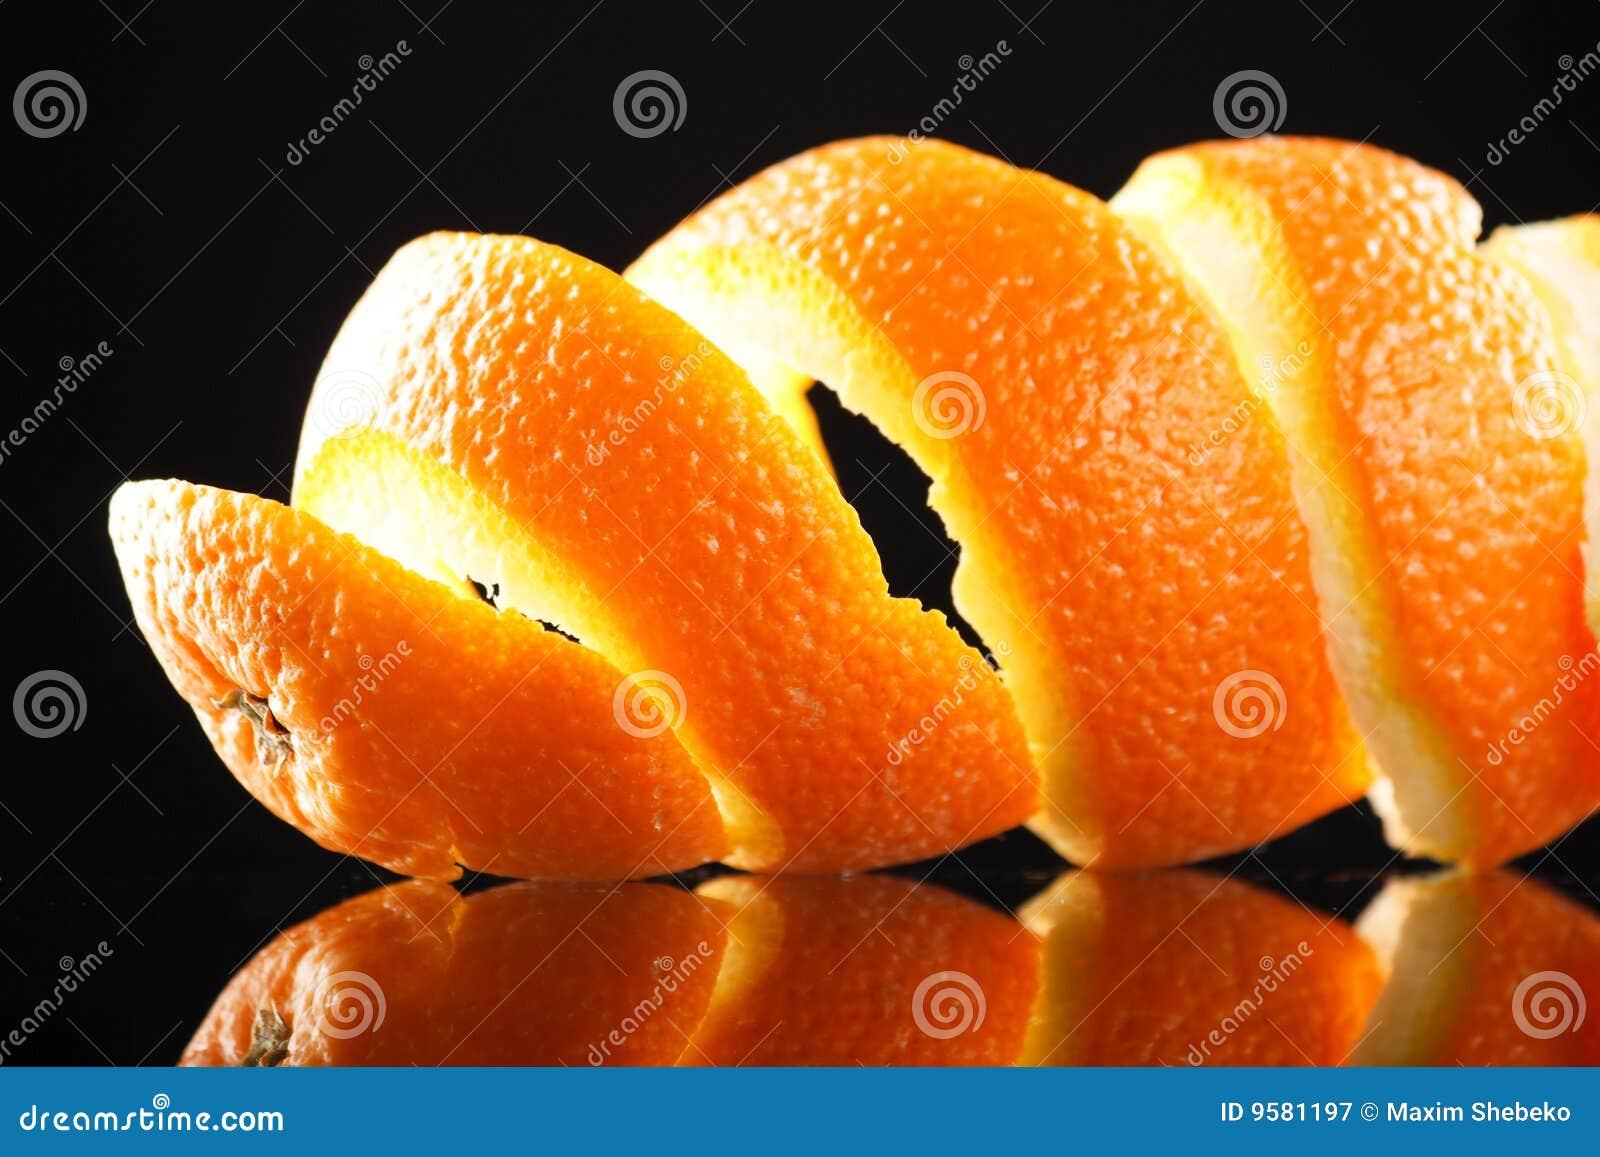 Spiral orange peel